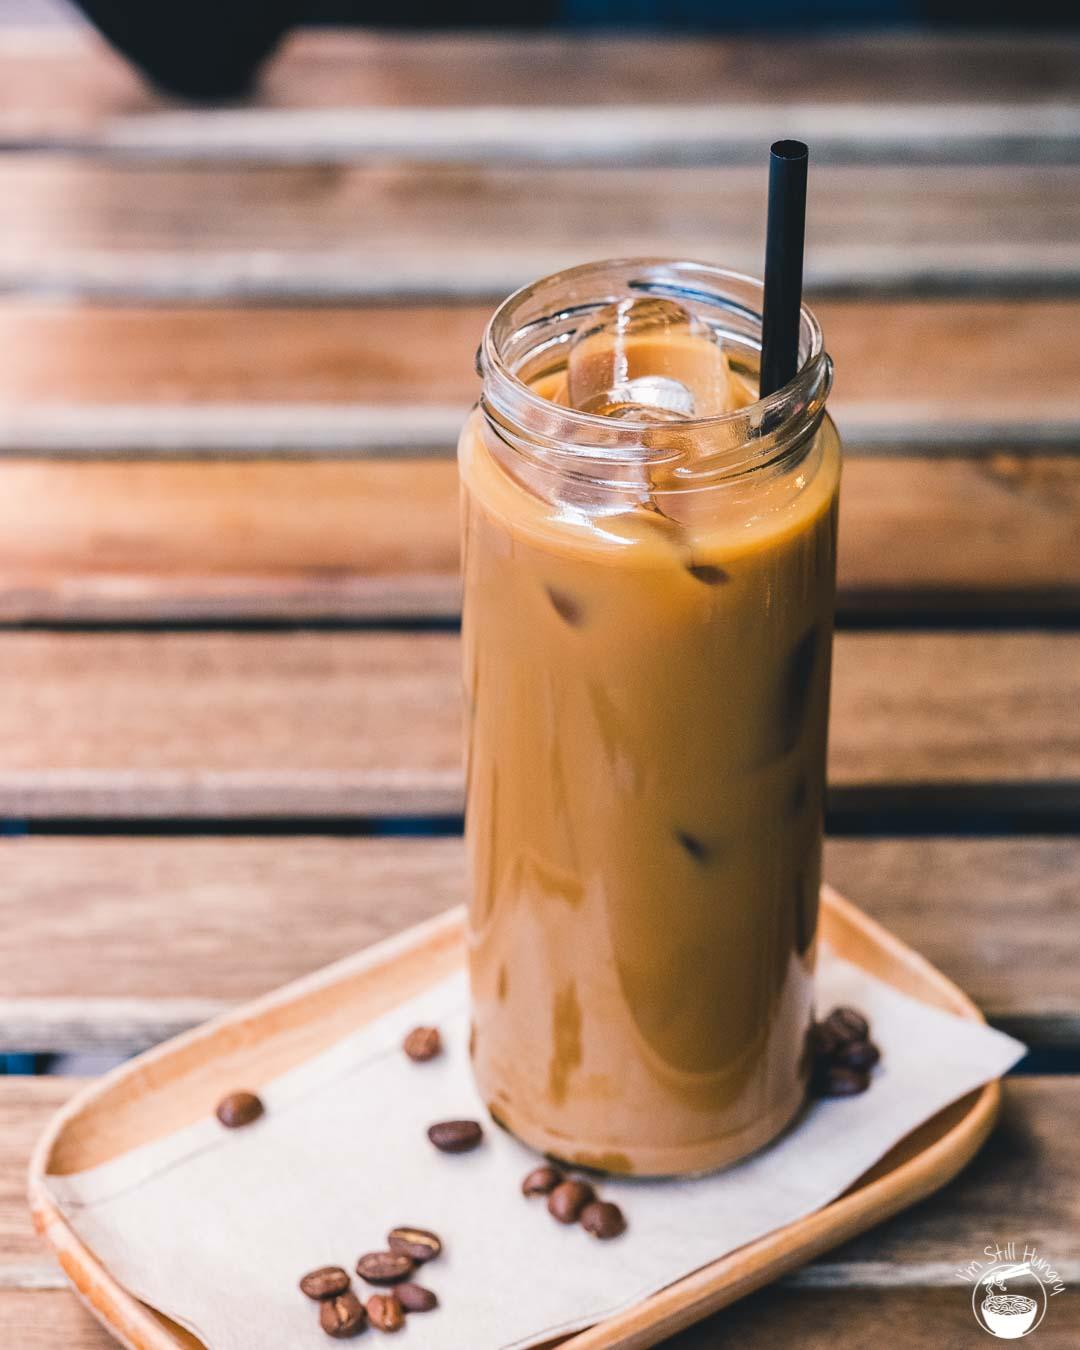 Kusuka Cafe Kopi susu: traditional sweetened Indonesial milk coffee